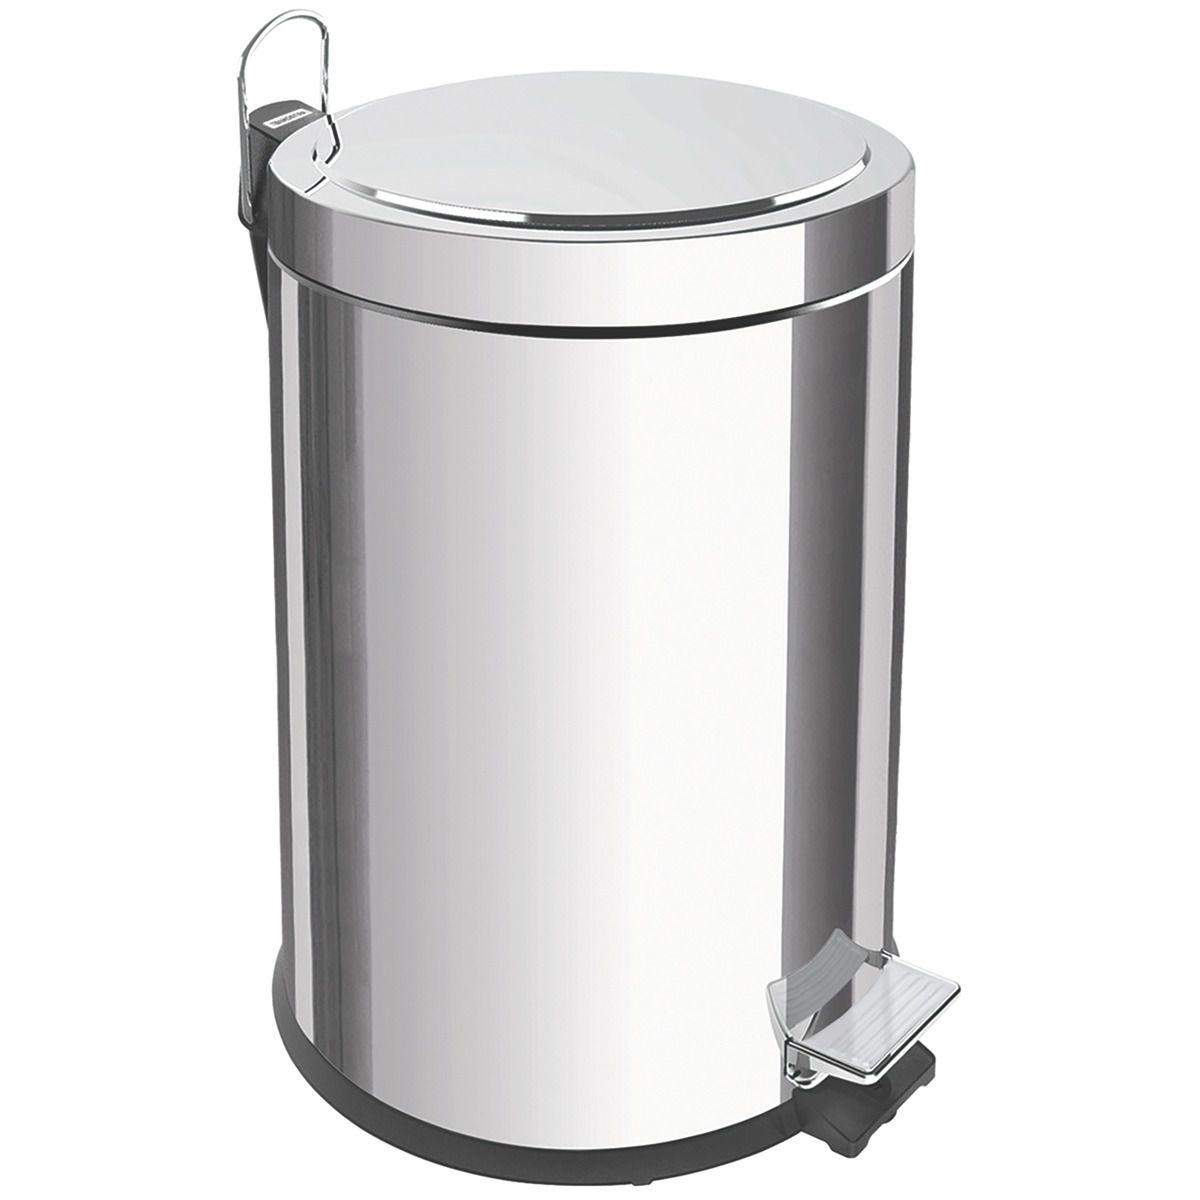 Lixeira Pedal Tramontina Inox -  5 / 12 / 20 / 30 litros